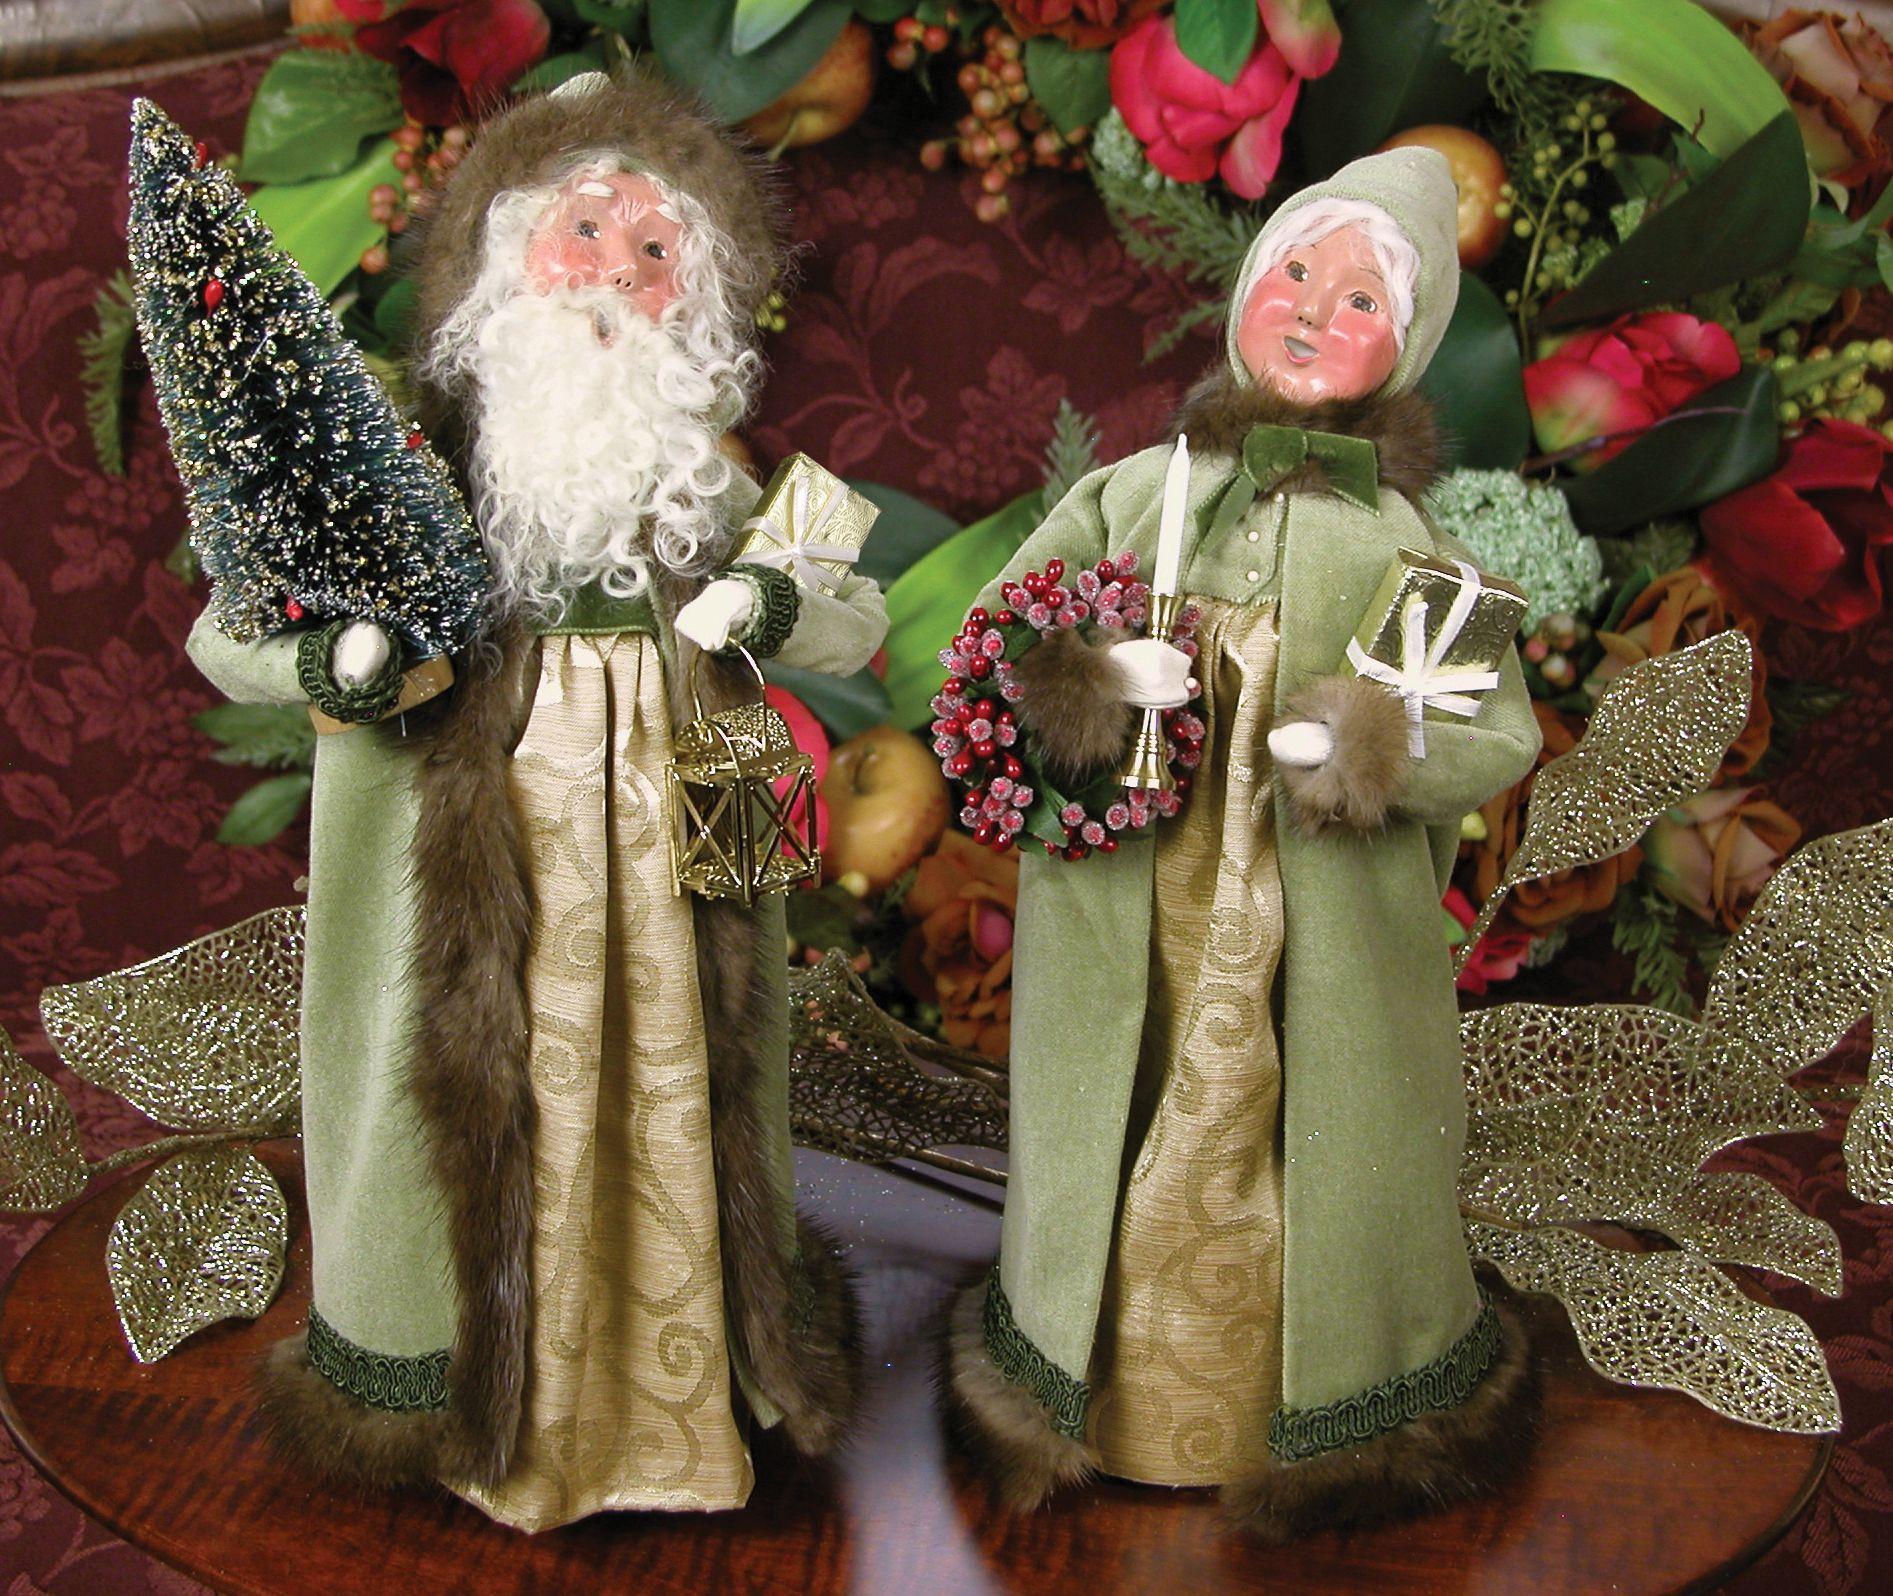 Christmas carolers figurines for sale - Byers Choice Caroler Figurines Mistletoe Mink Santa And Mrs Claus